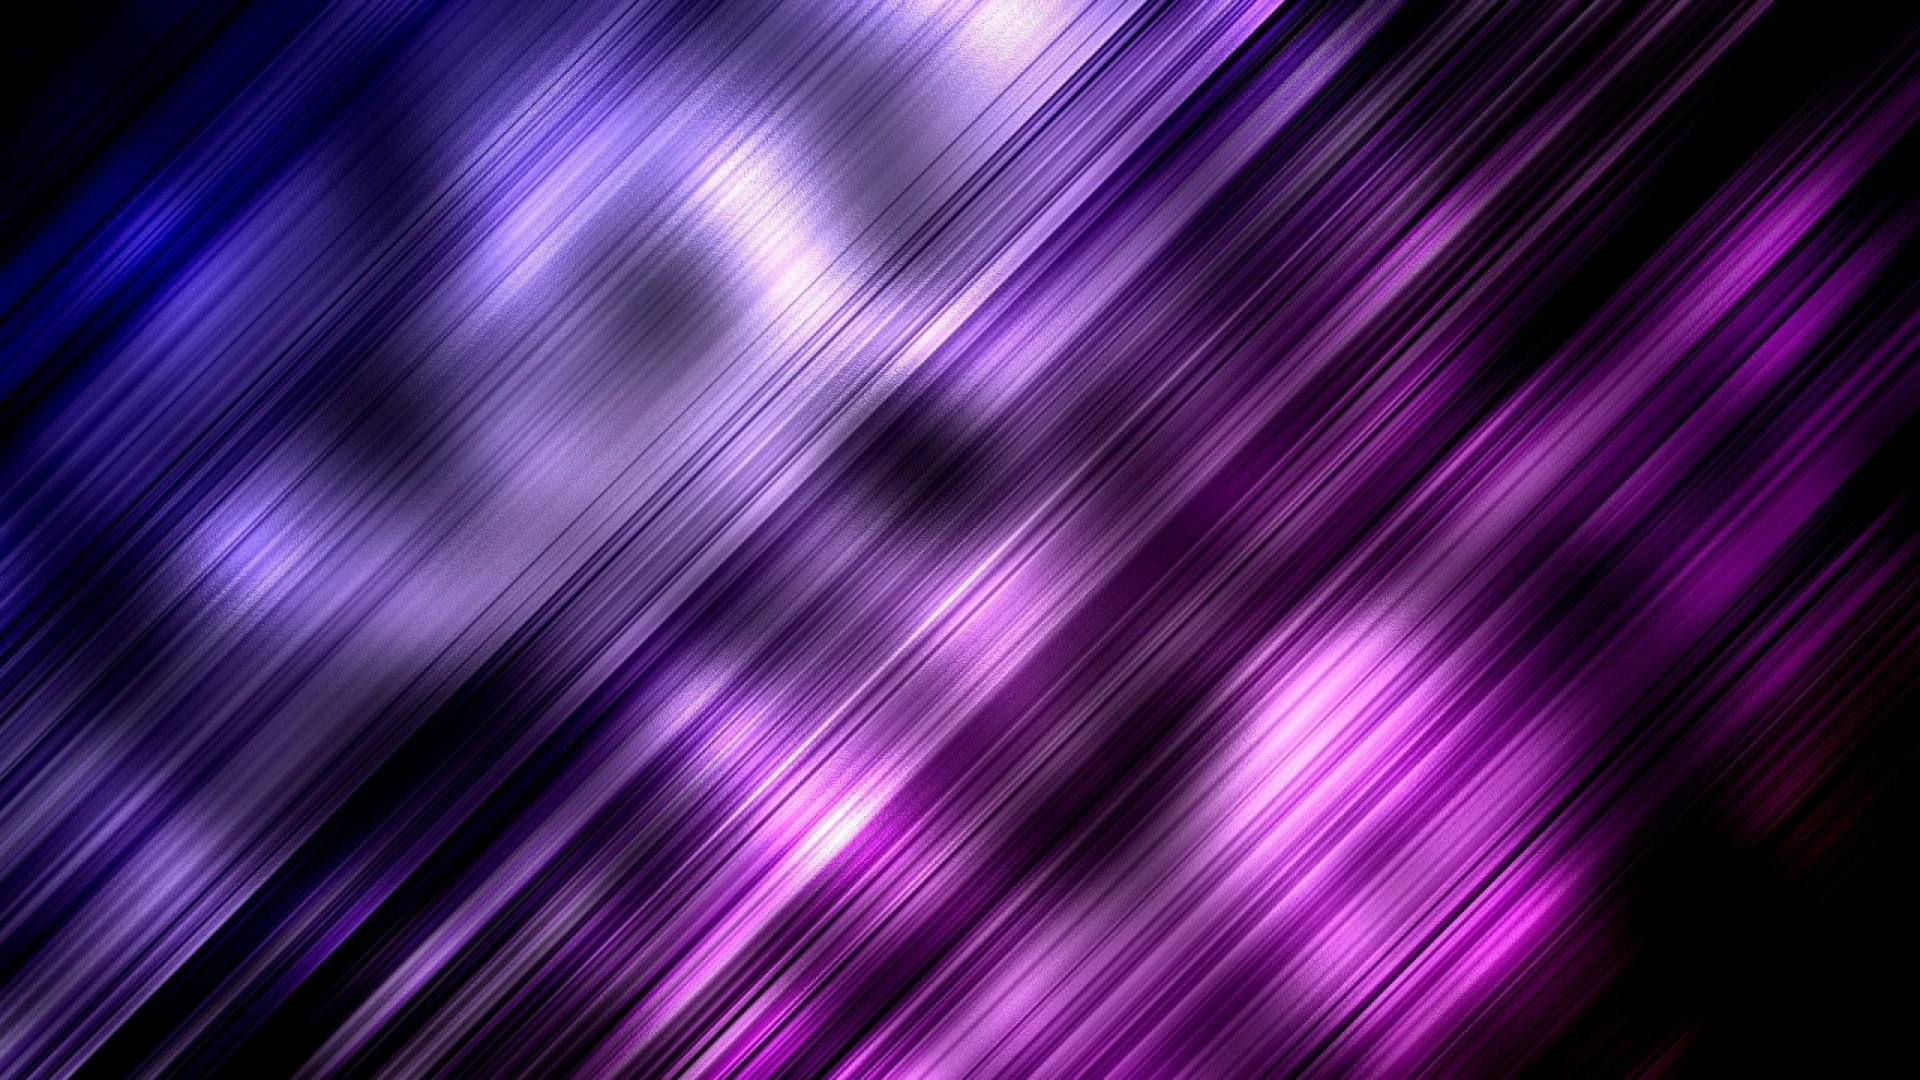 Light Purple wallpaper photo hd